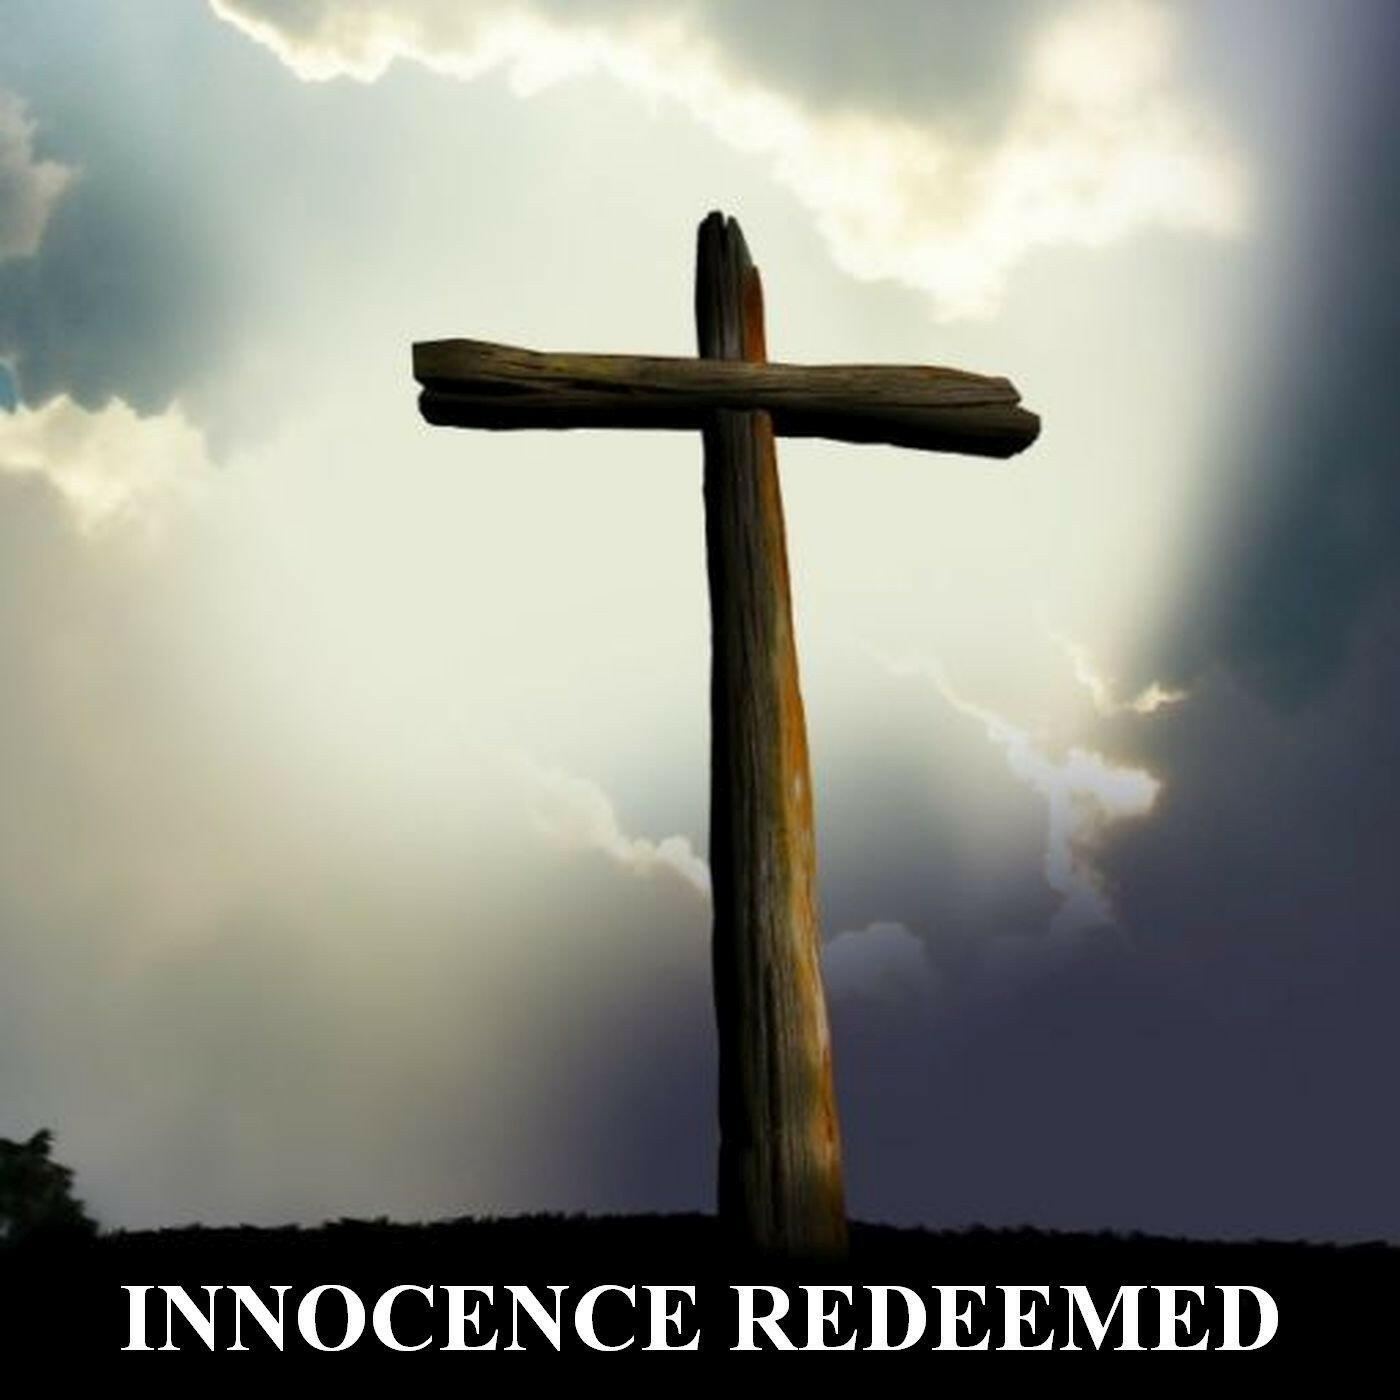 Innocence Redeemed